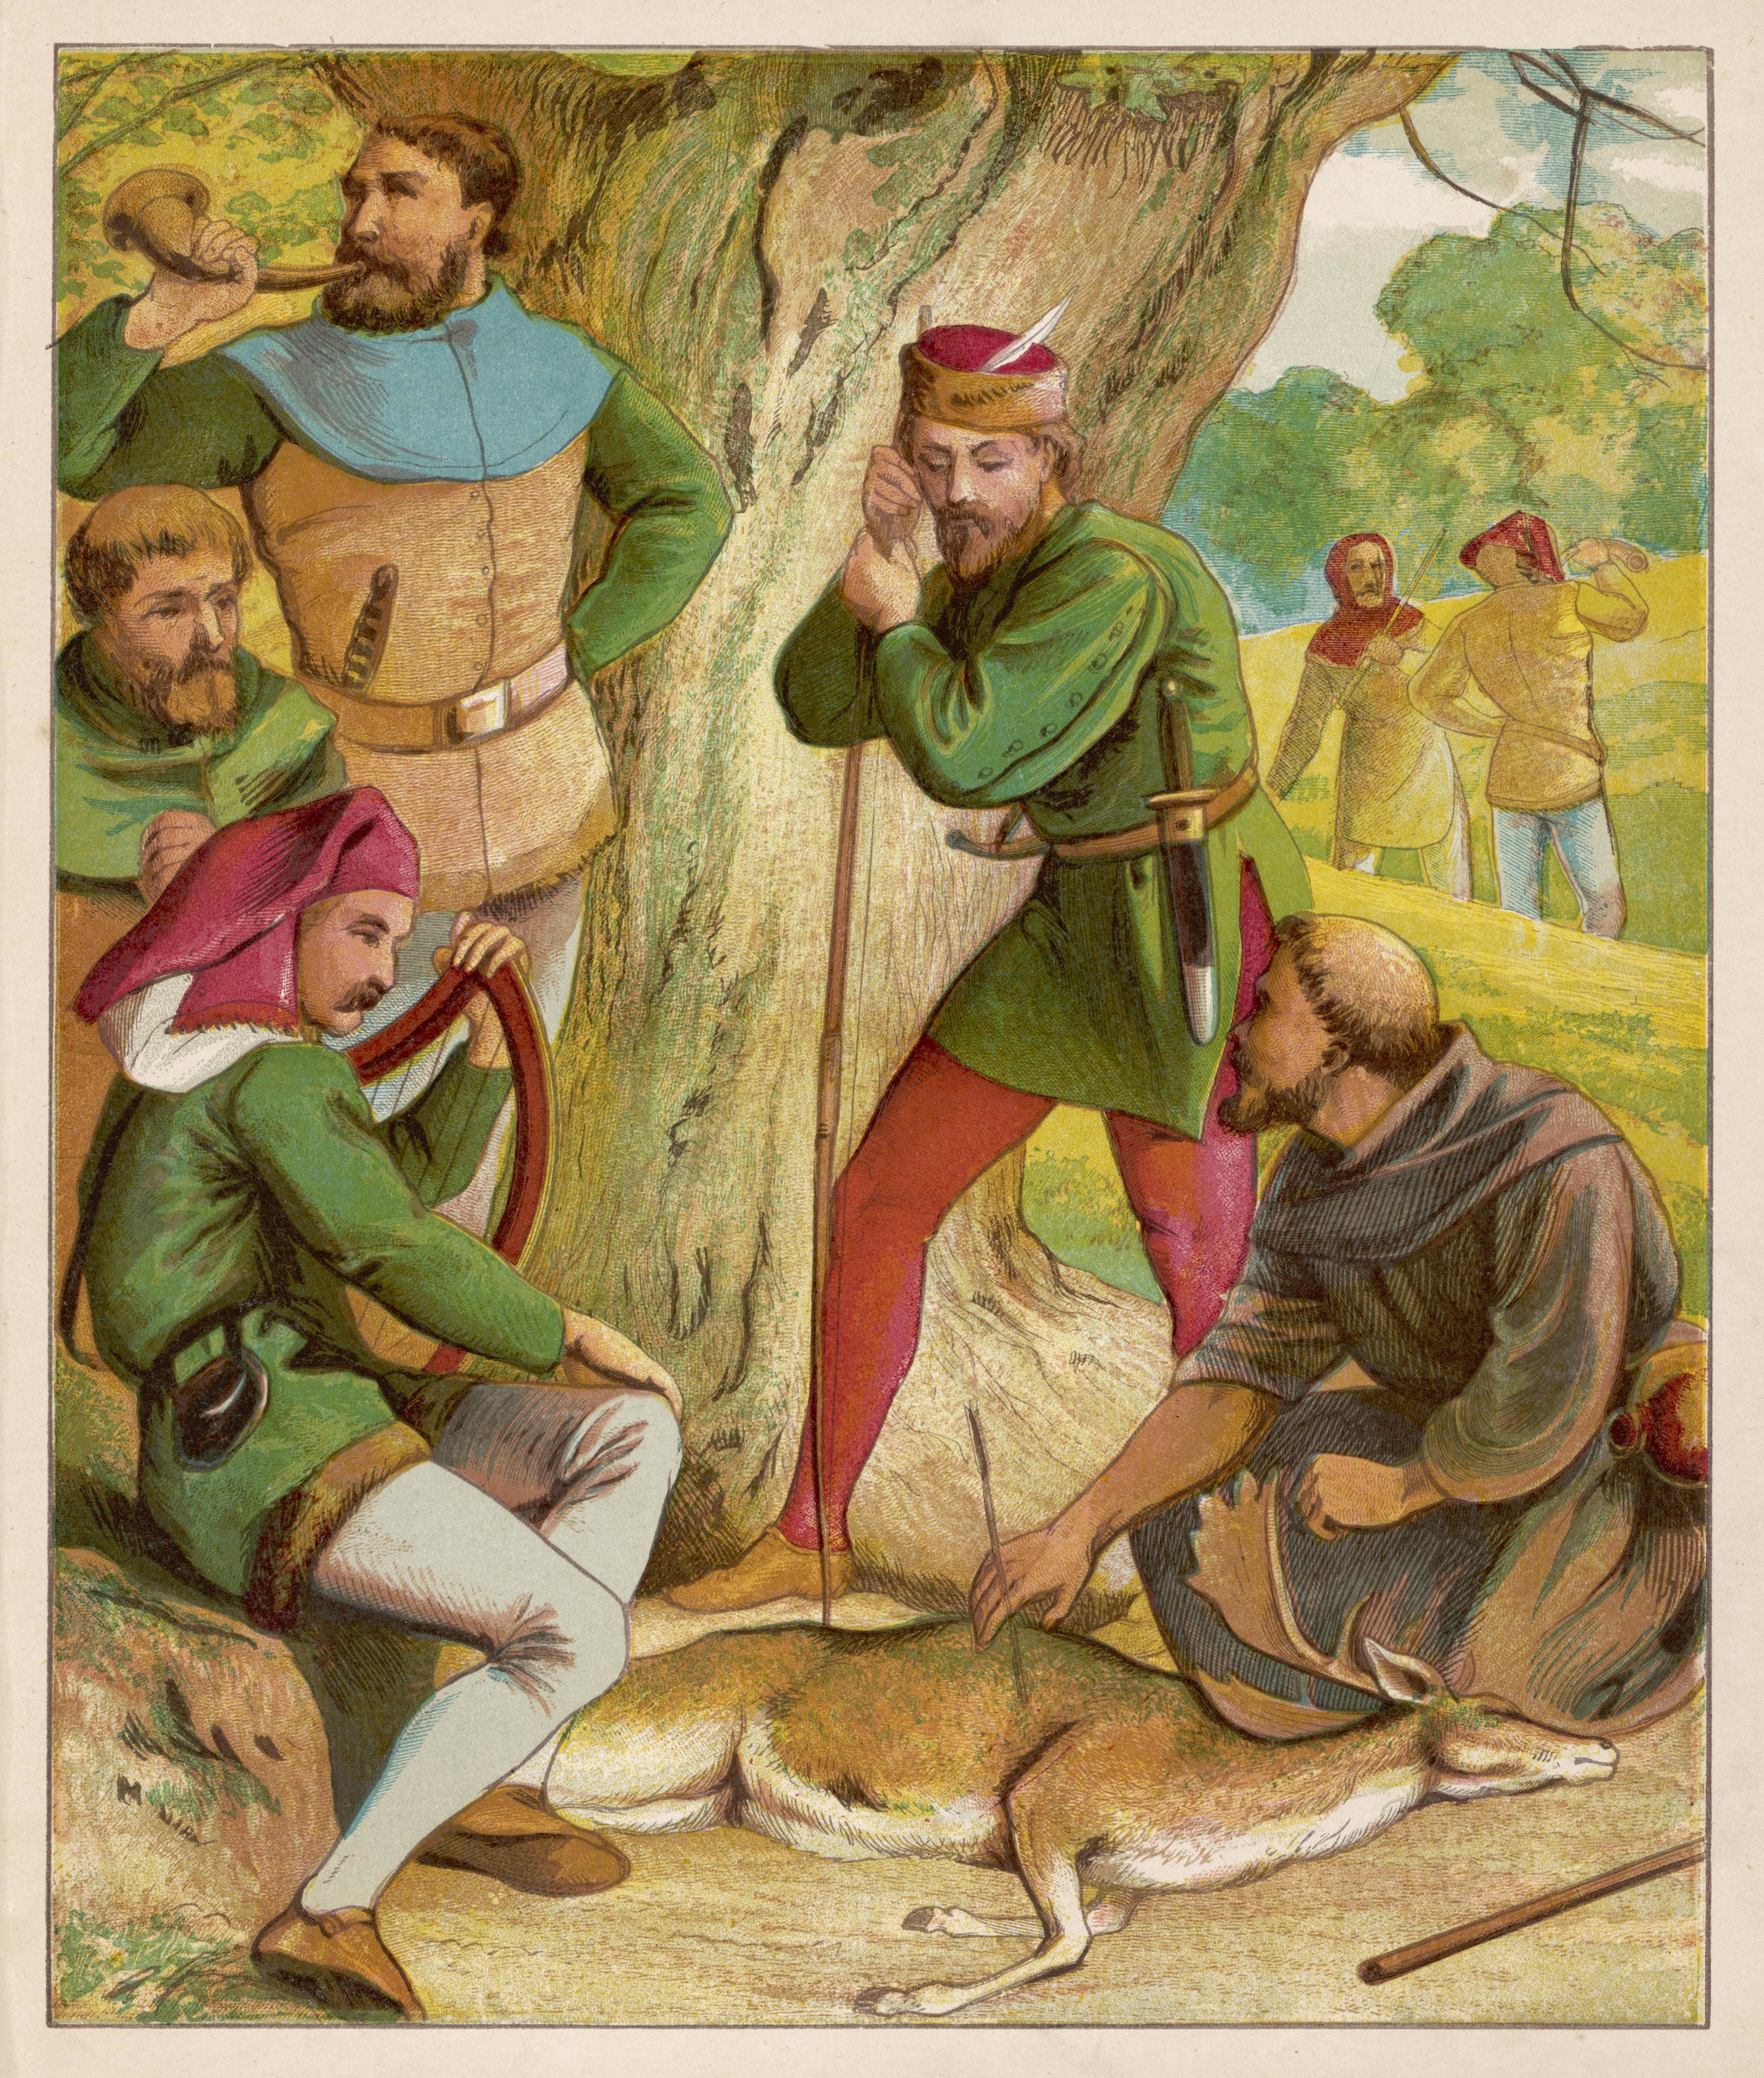 Robin Hood - Merry Men. Date: circa 1860